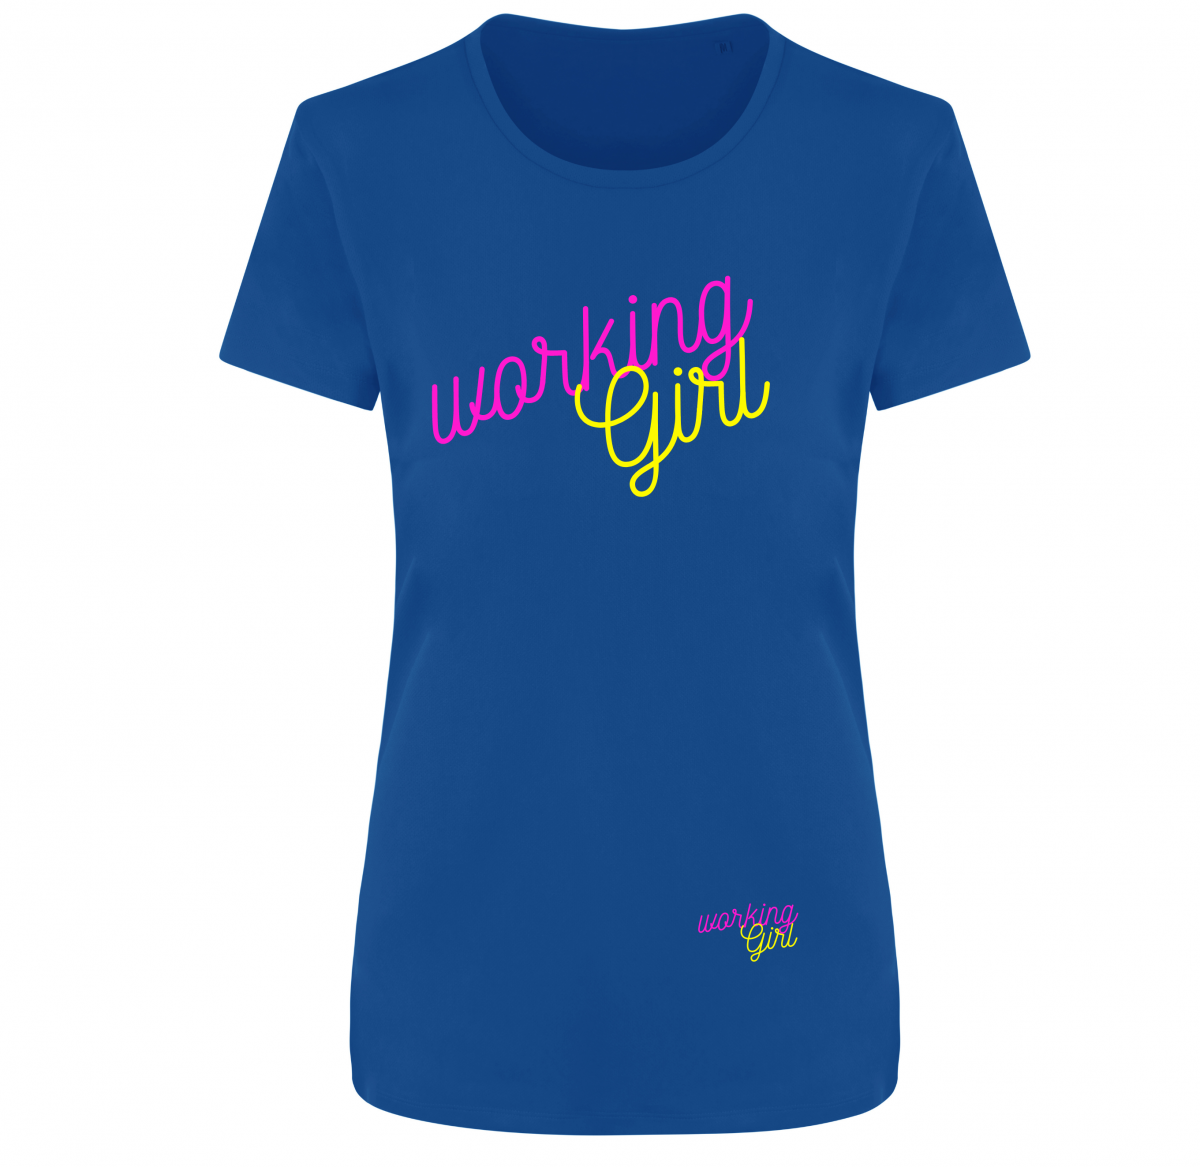 Tee-Shirt Femme Performance – Working Girl